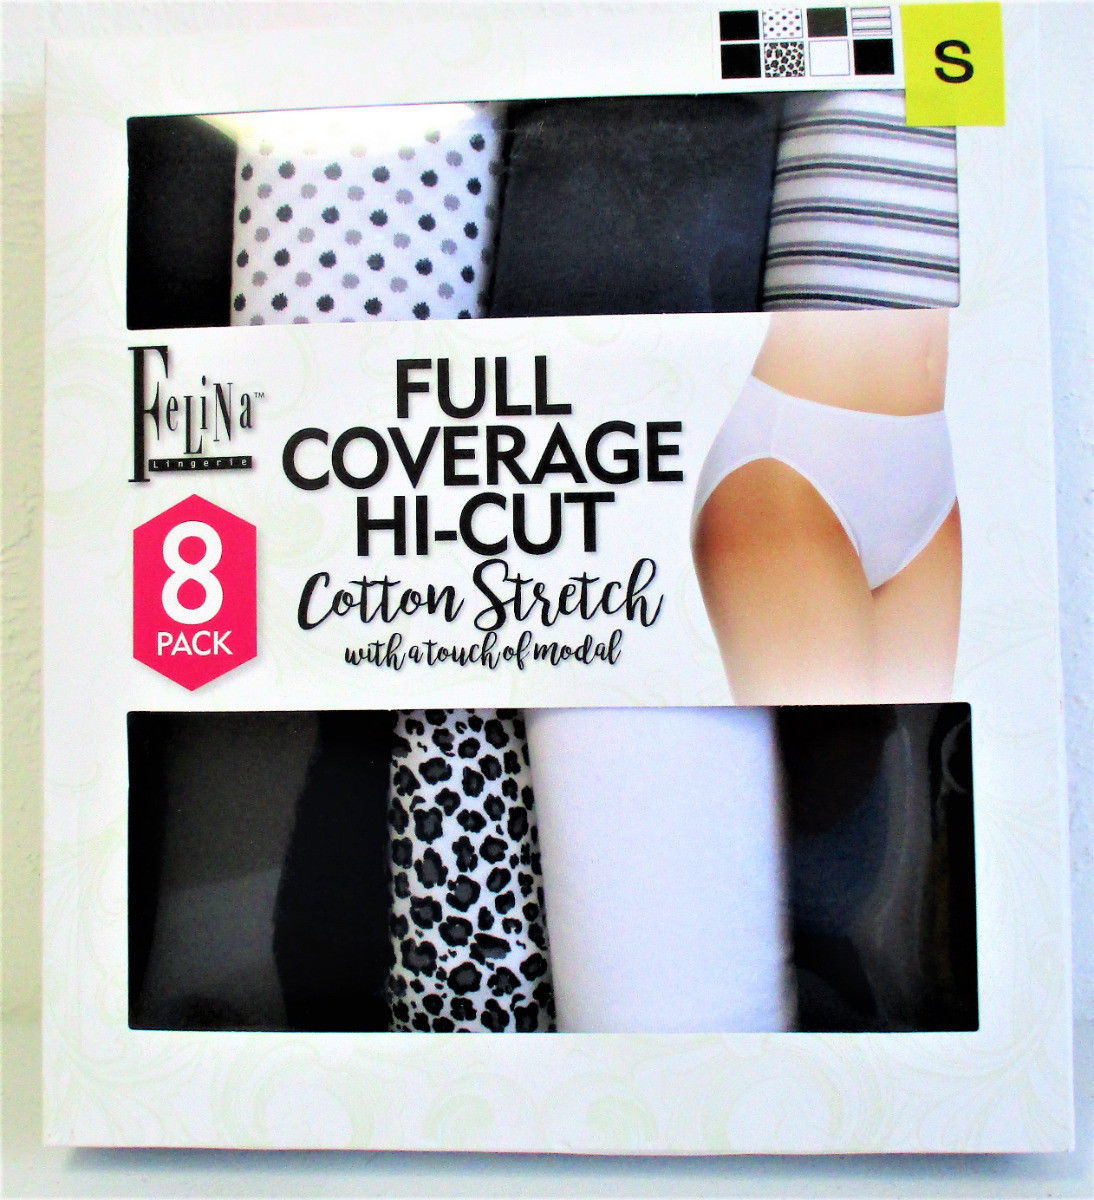 09559caa1c66 Felina Women's Full Coverage Hi-Cut Cotton Stretch 8-Pack Size: Small